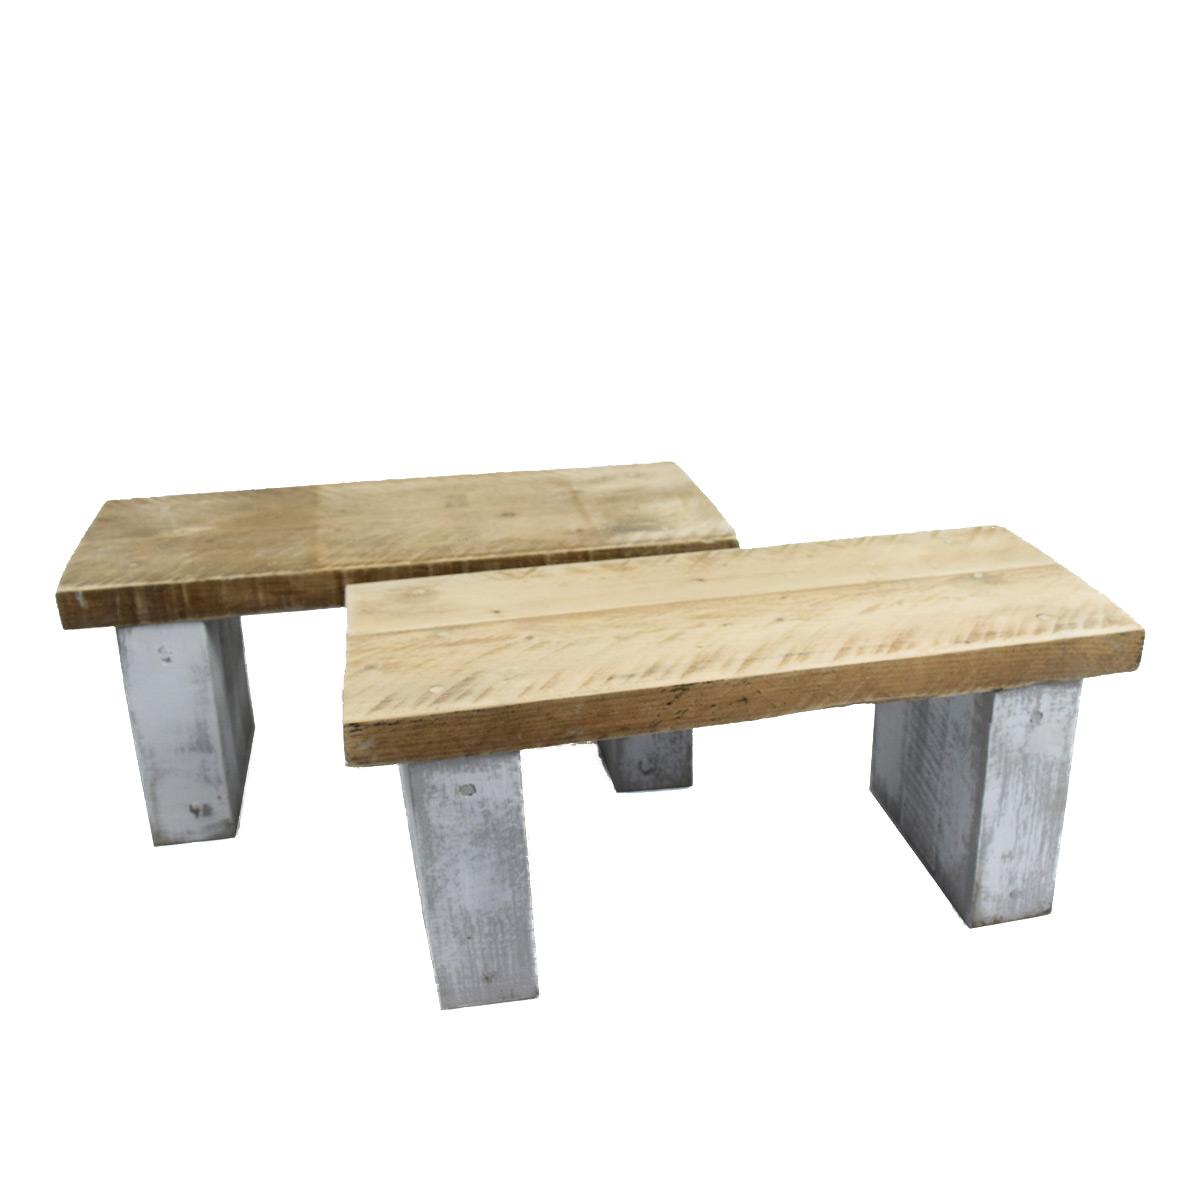 Rustic All Wood Coffee Table: Reclaimed Rustic Wood Mini Coffee Table